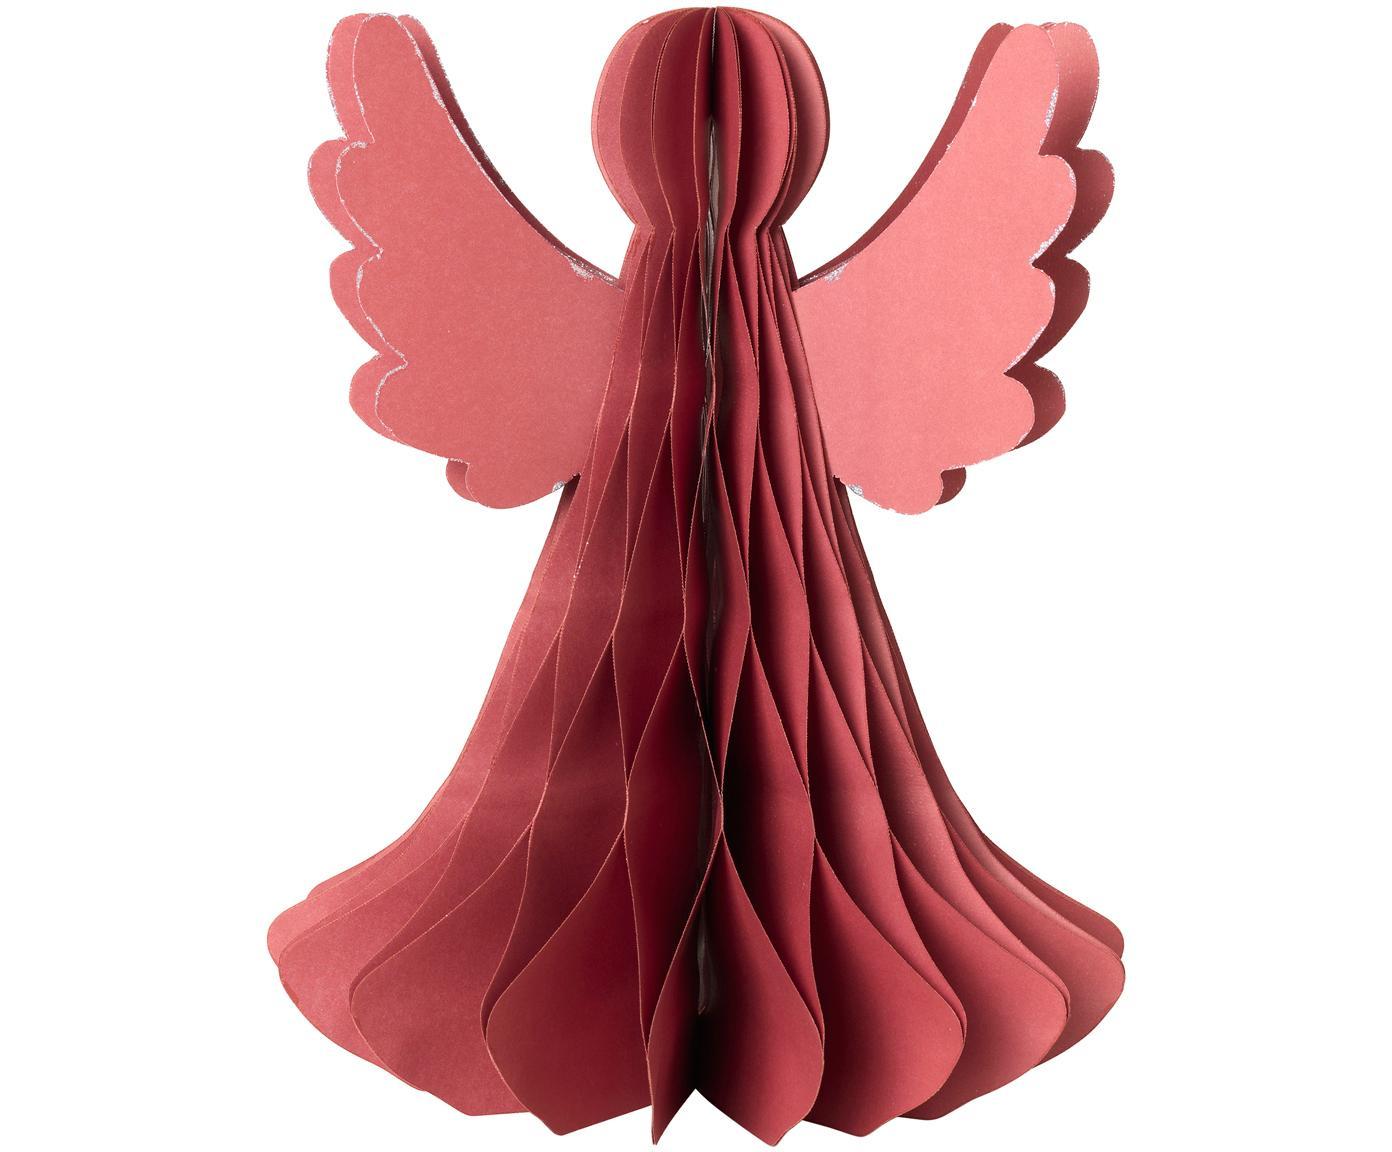 XL Deko-Objekt Angel, Papier, Rot, Ø 21 x H 27 cm